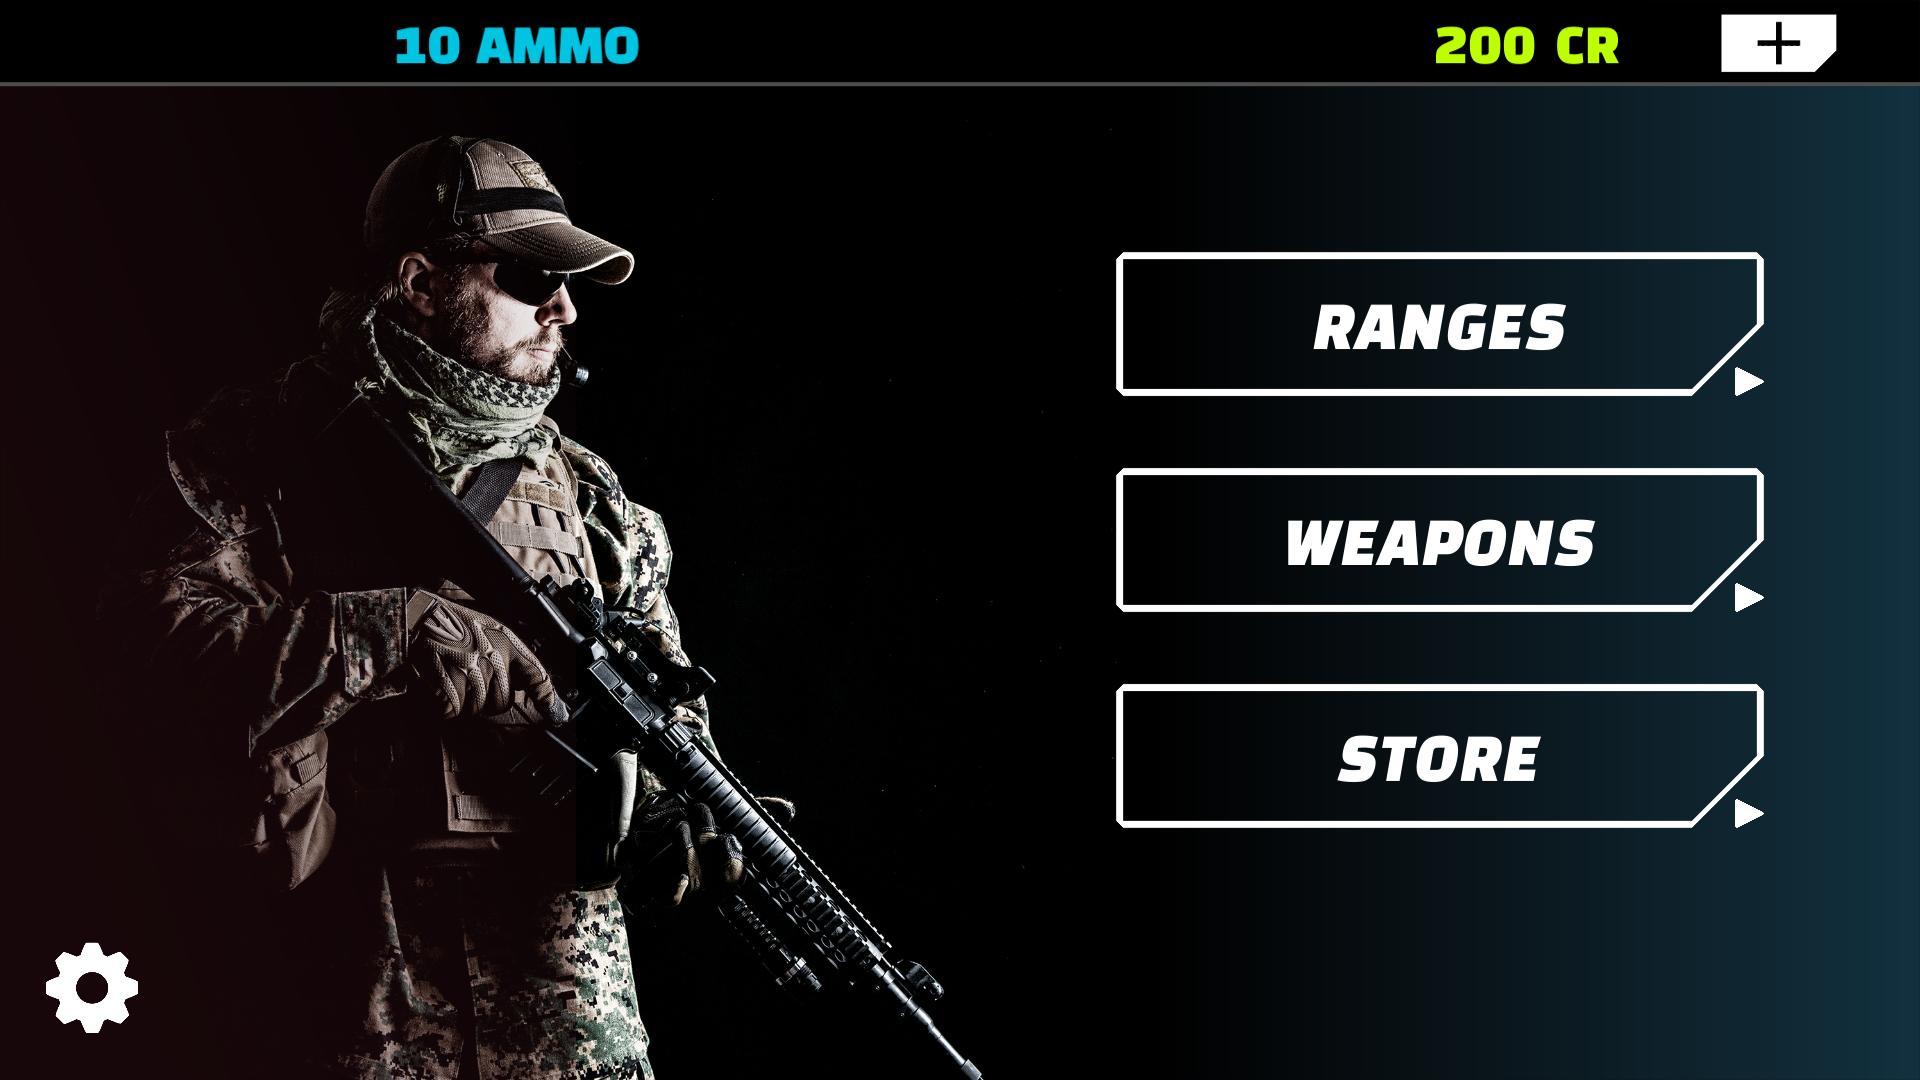 Canyon Shooting 2 - Free Shooting Range 3.0.6 Screenshot 6